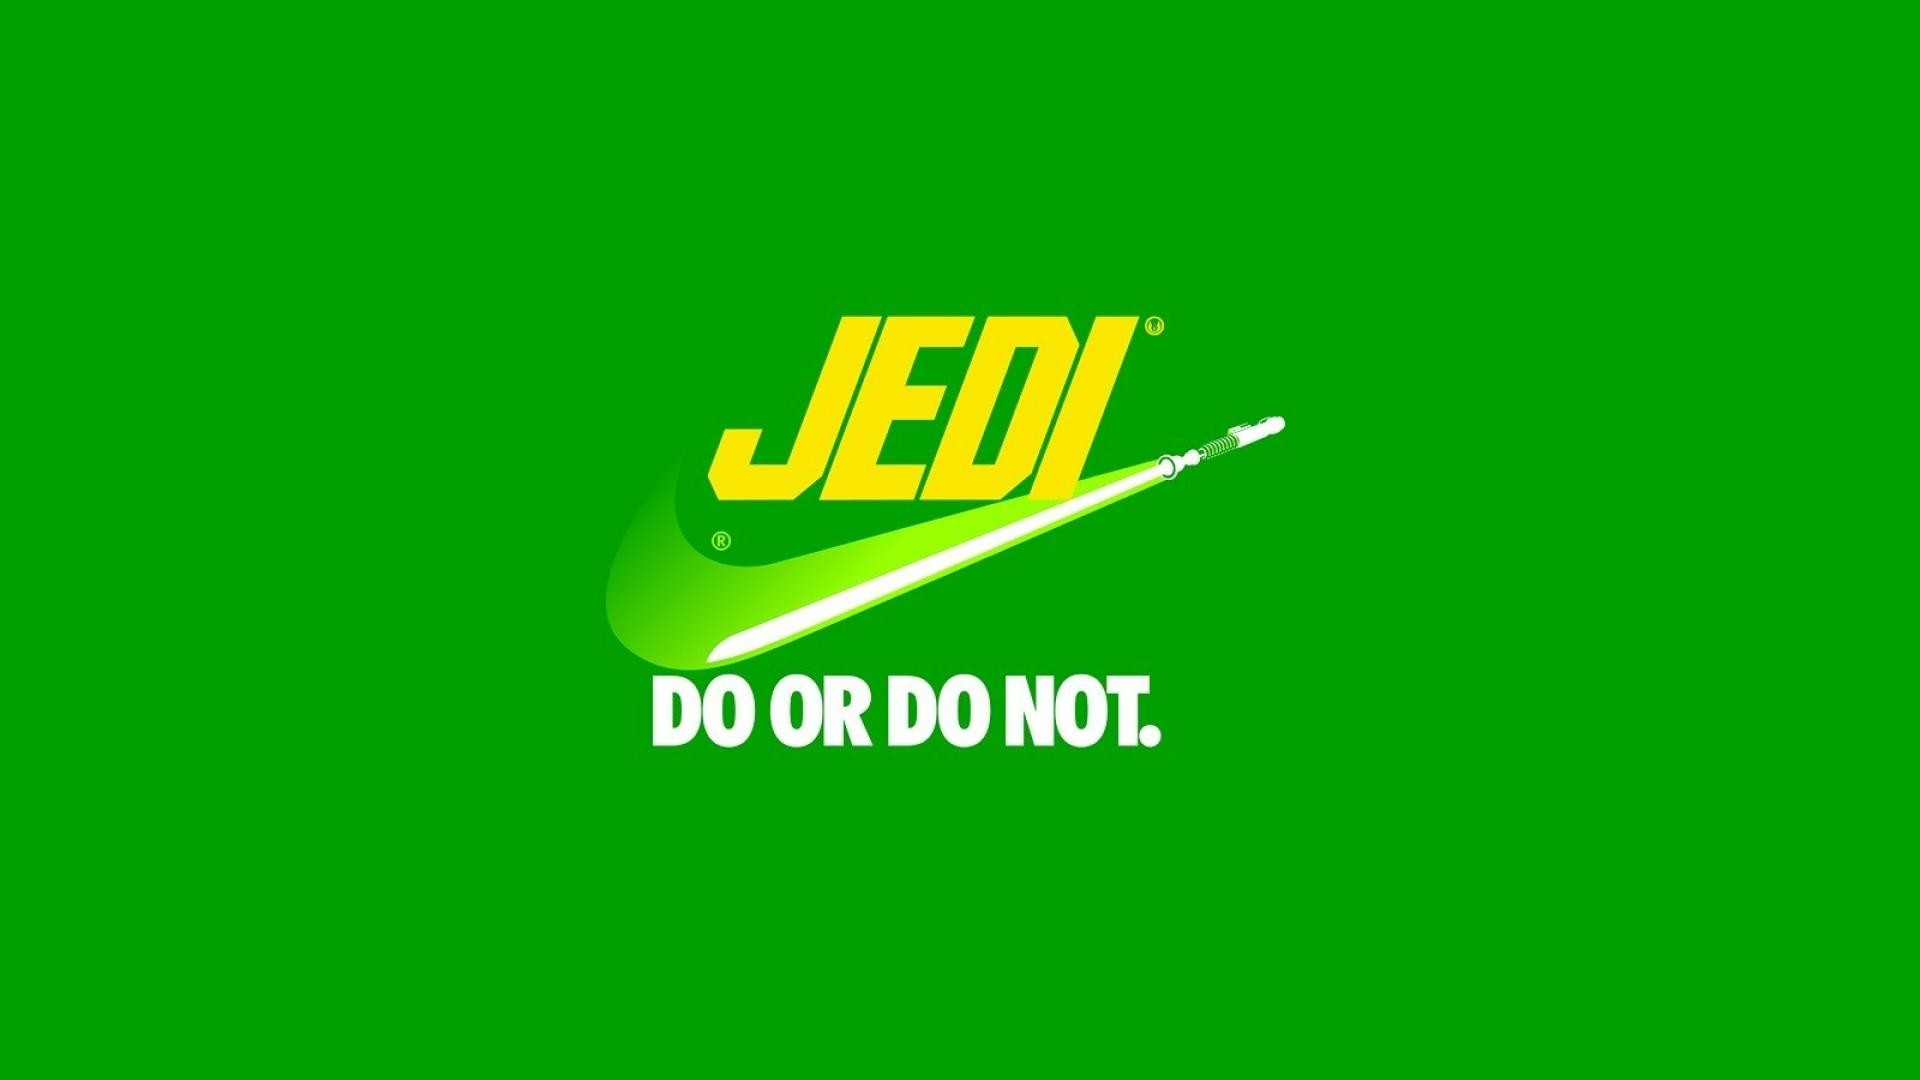 Star wars minimalistic front jedi parody nike logos wallpaper   (893)